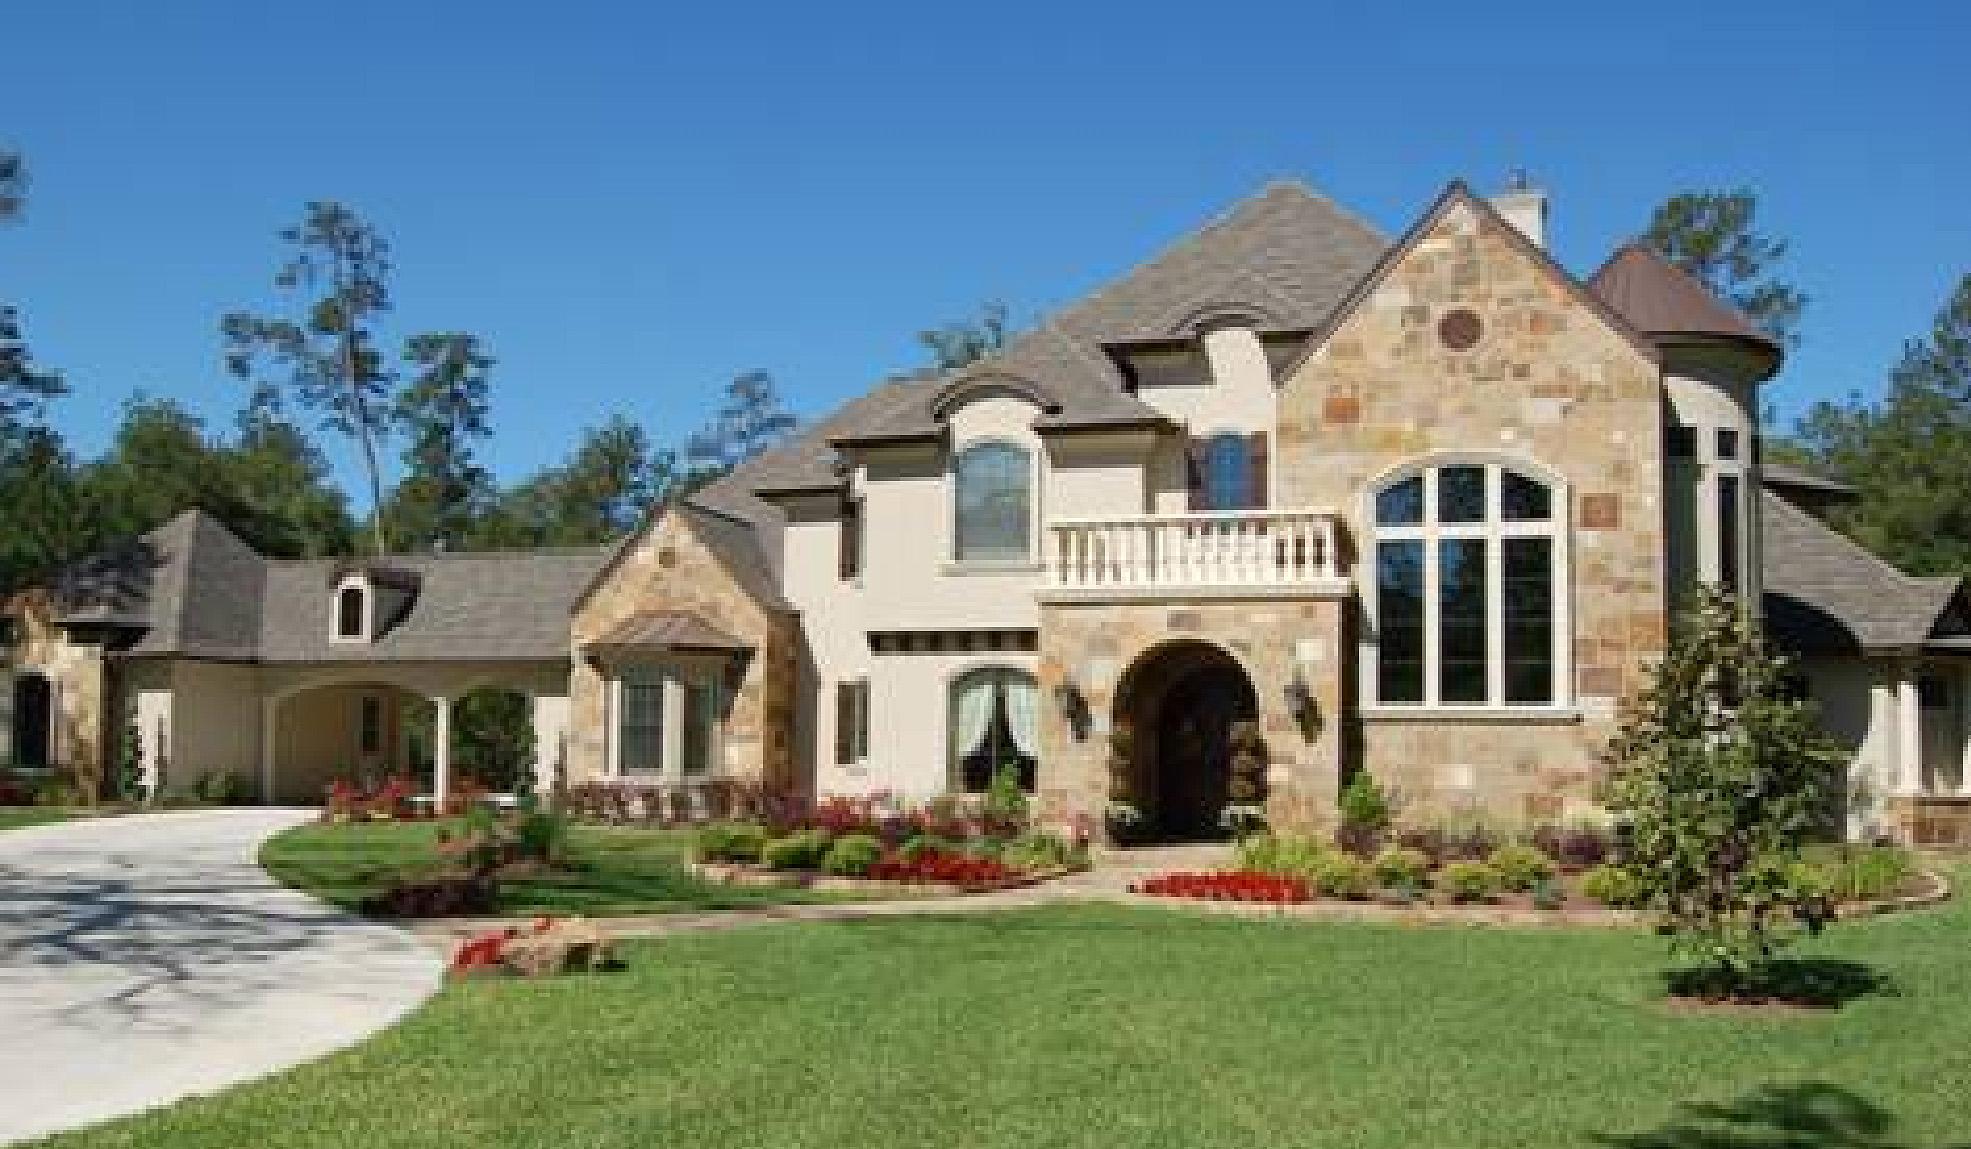 Impressive French Country Estate - 67116gl Architectural